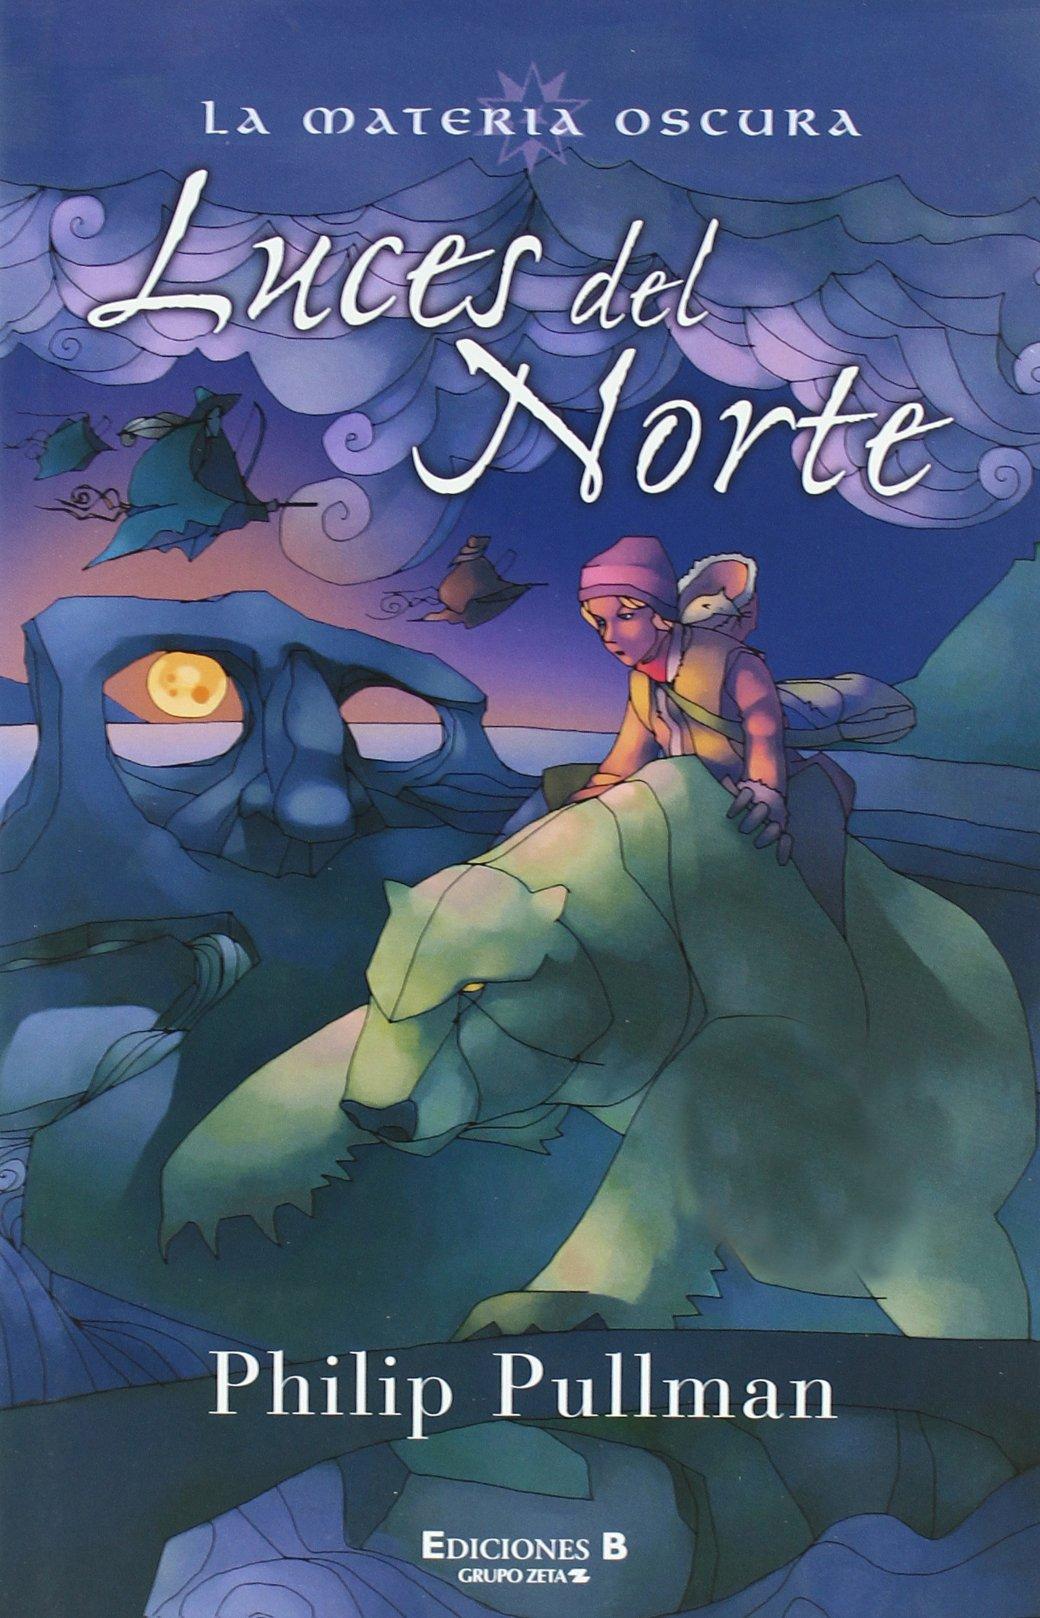 Materia oscura: Luces del norte Hardcover – May 1, 2005